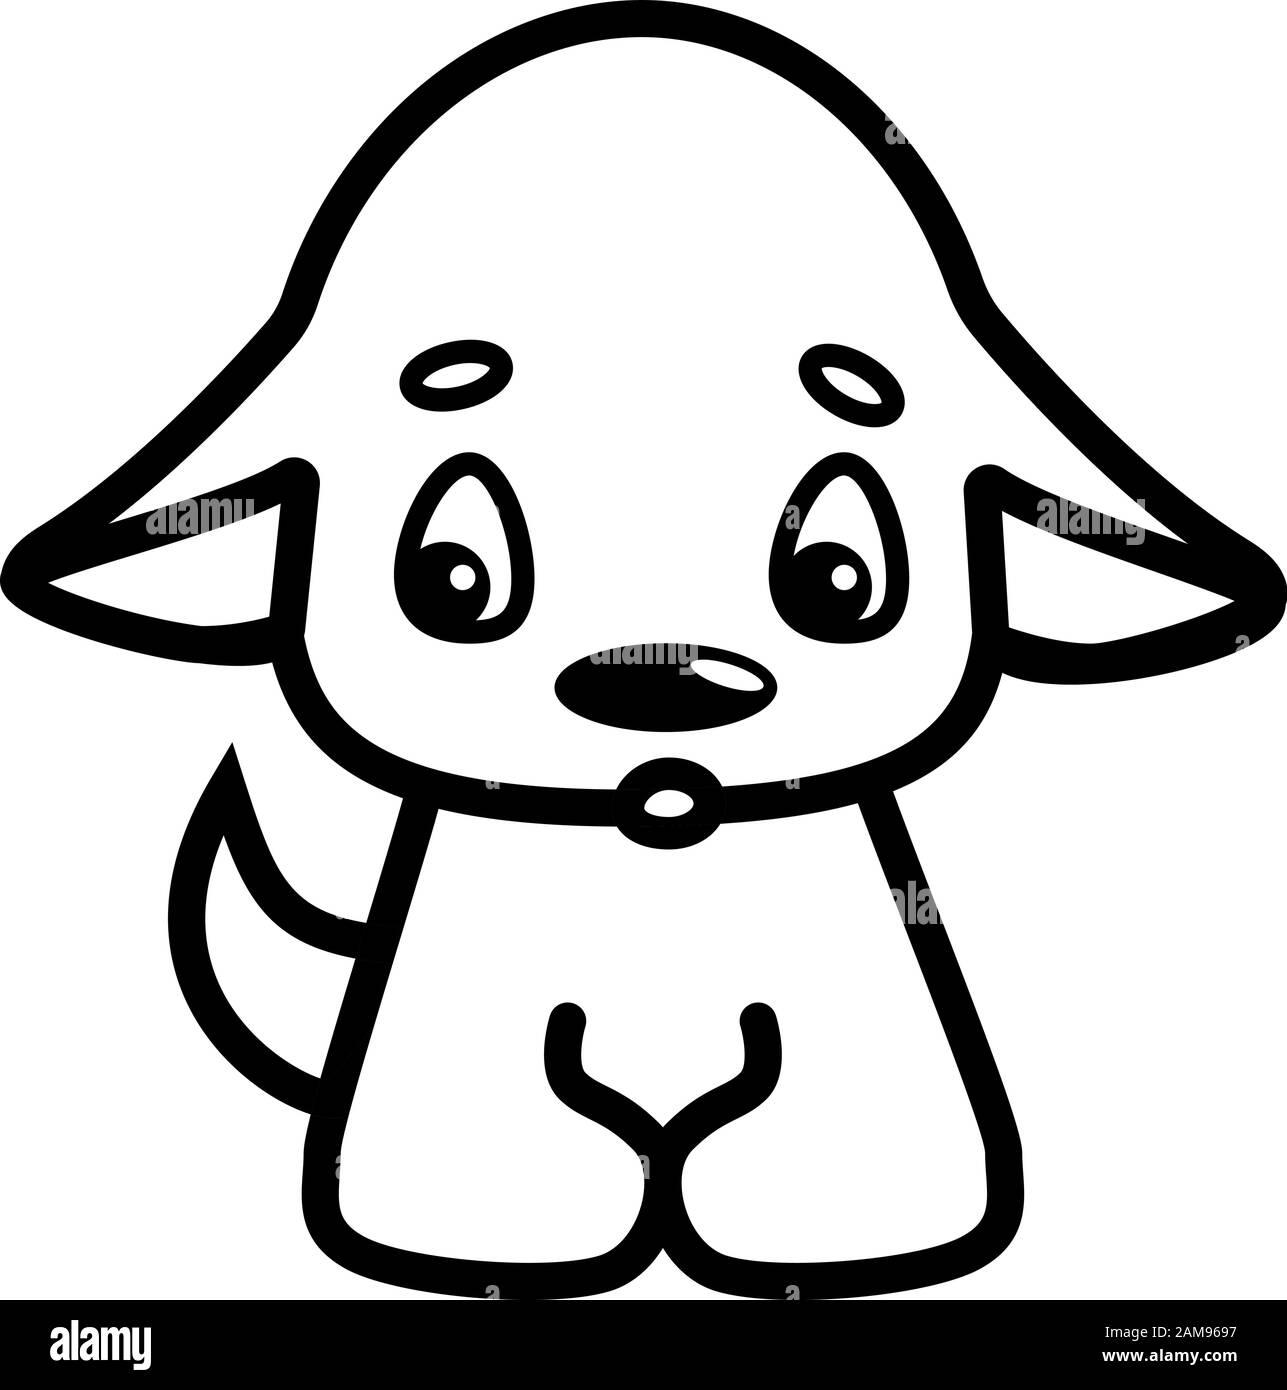 Cartoon Dog Black And White Stock Photos Images Alamy